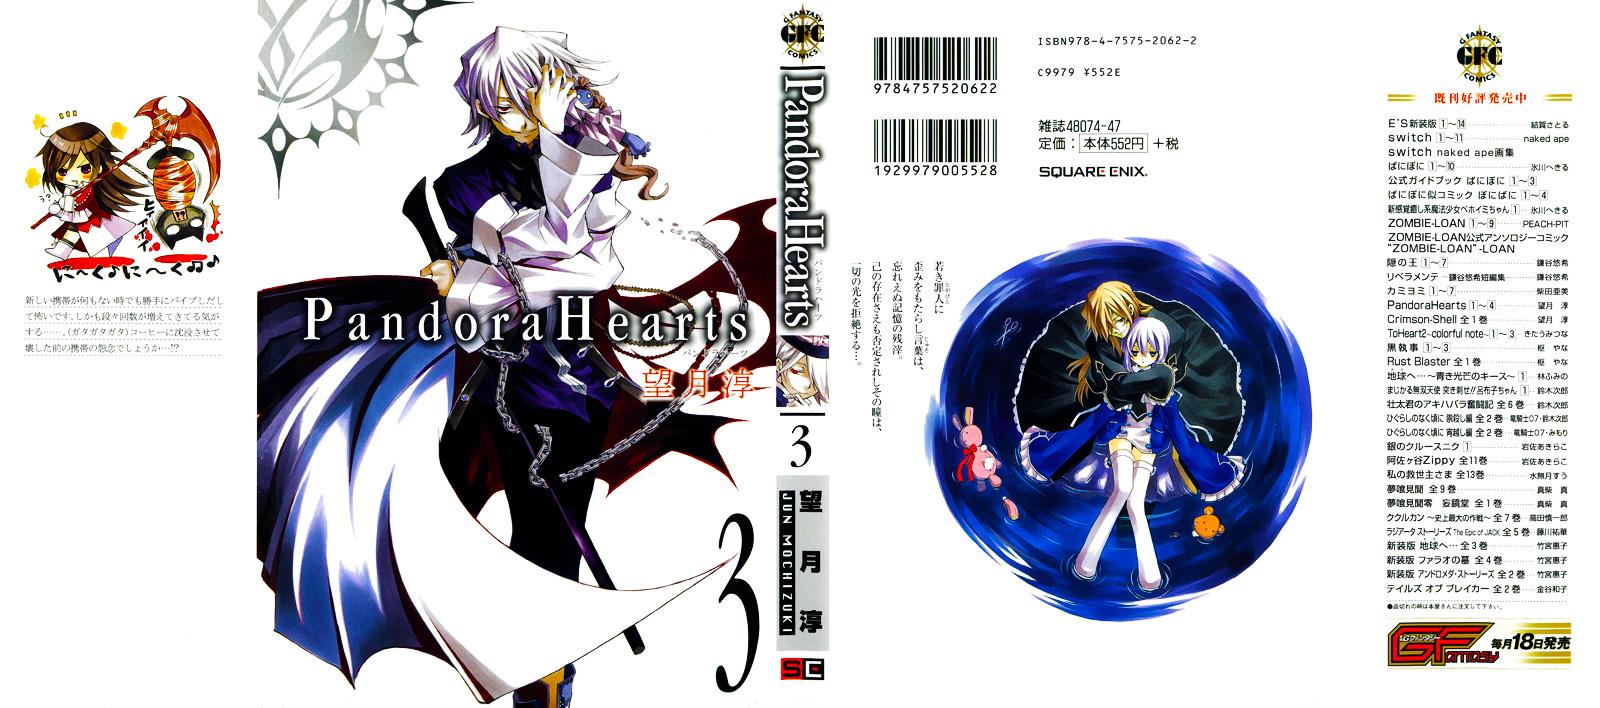 Pandora Hearts chương 010 - retrace: x malediction trang 1